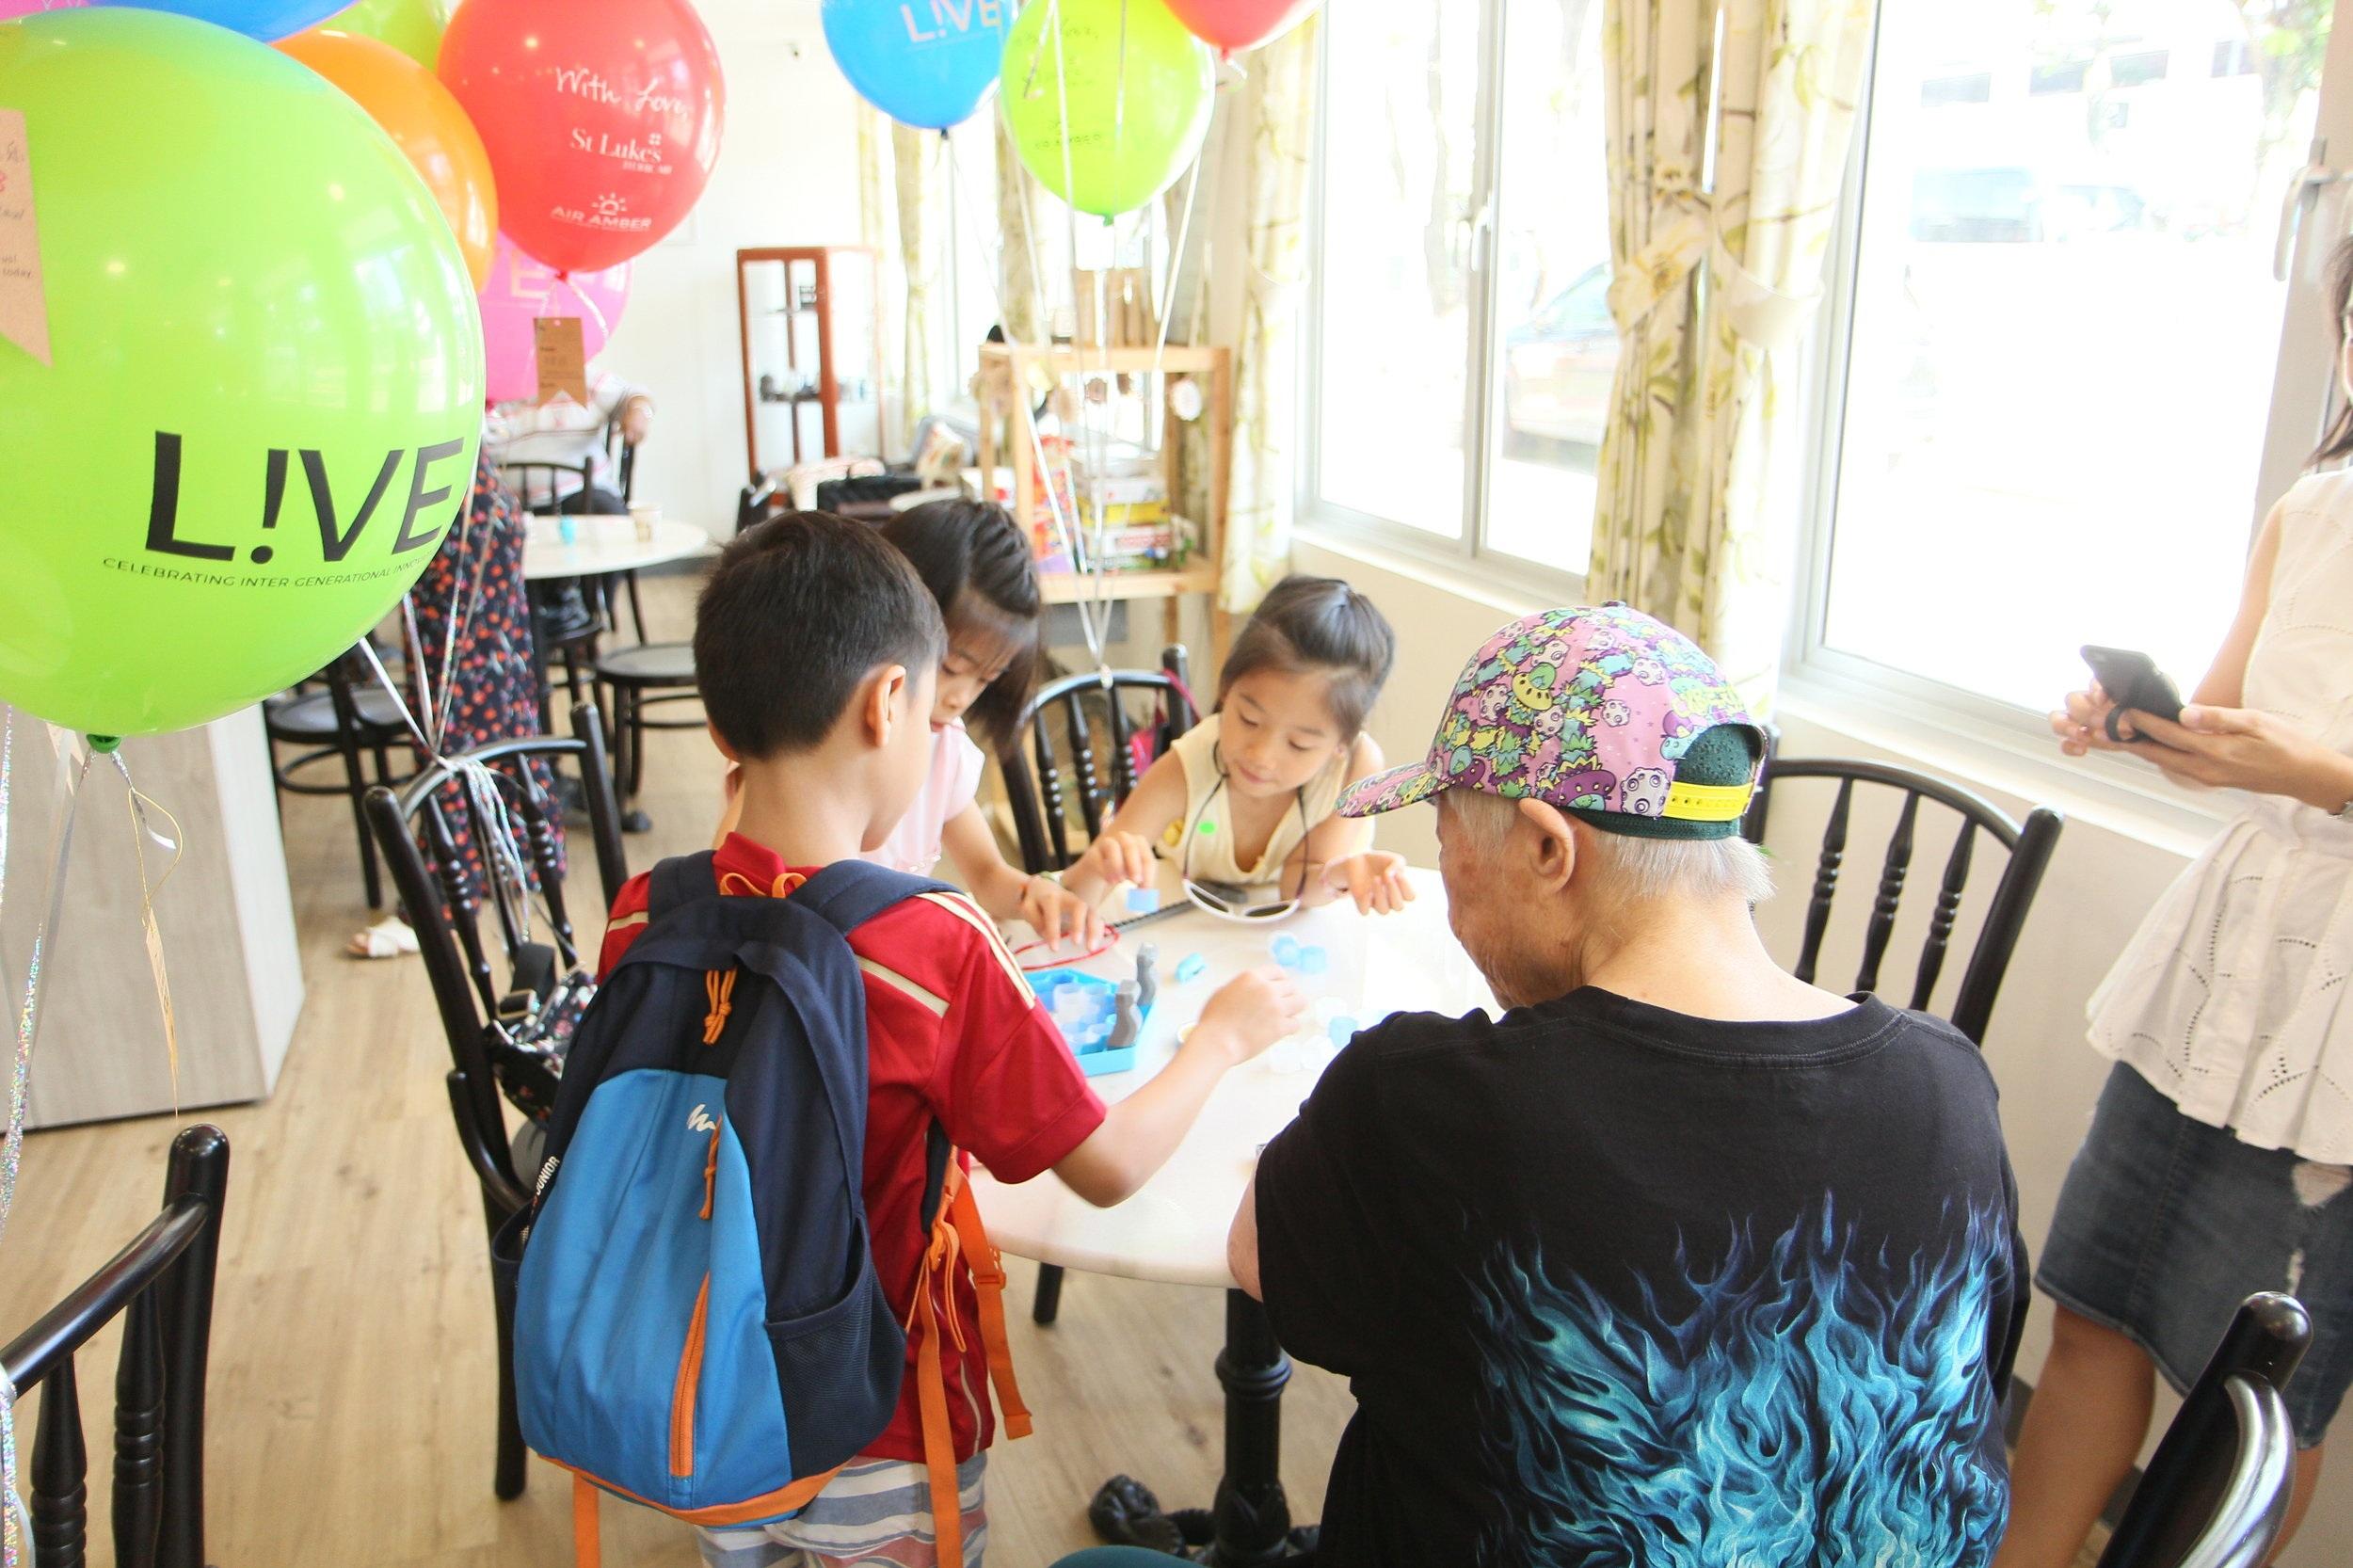 Amber-LIVE-Cafe-Intergenerational-Innovation.JPG